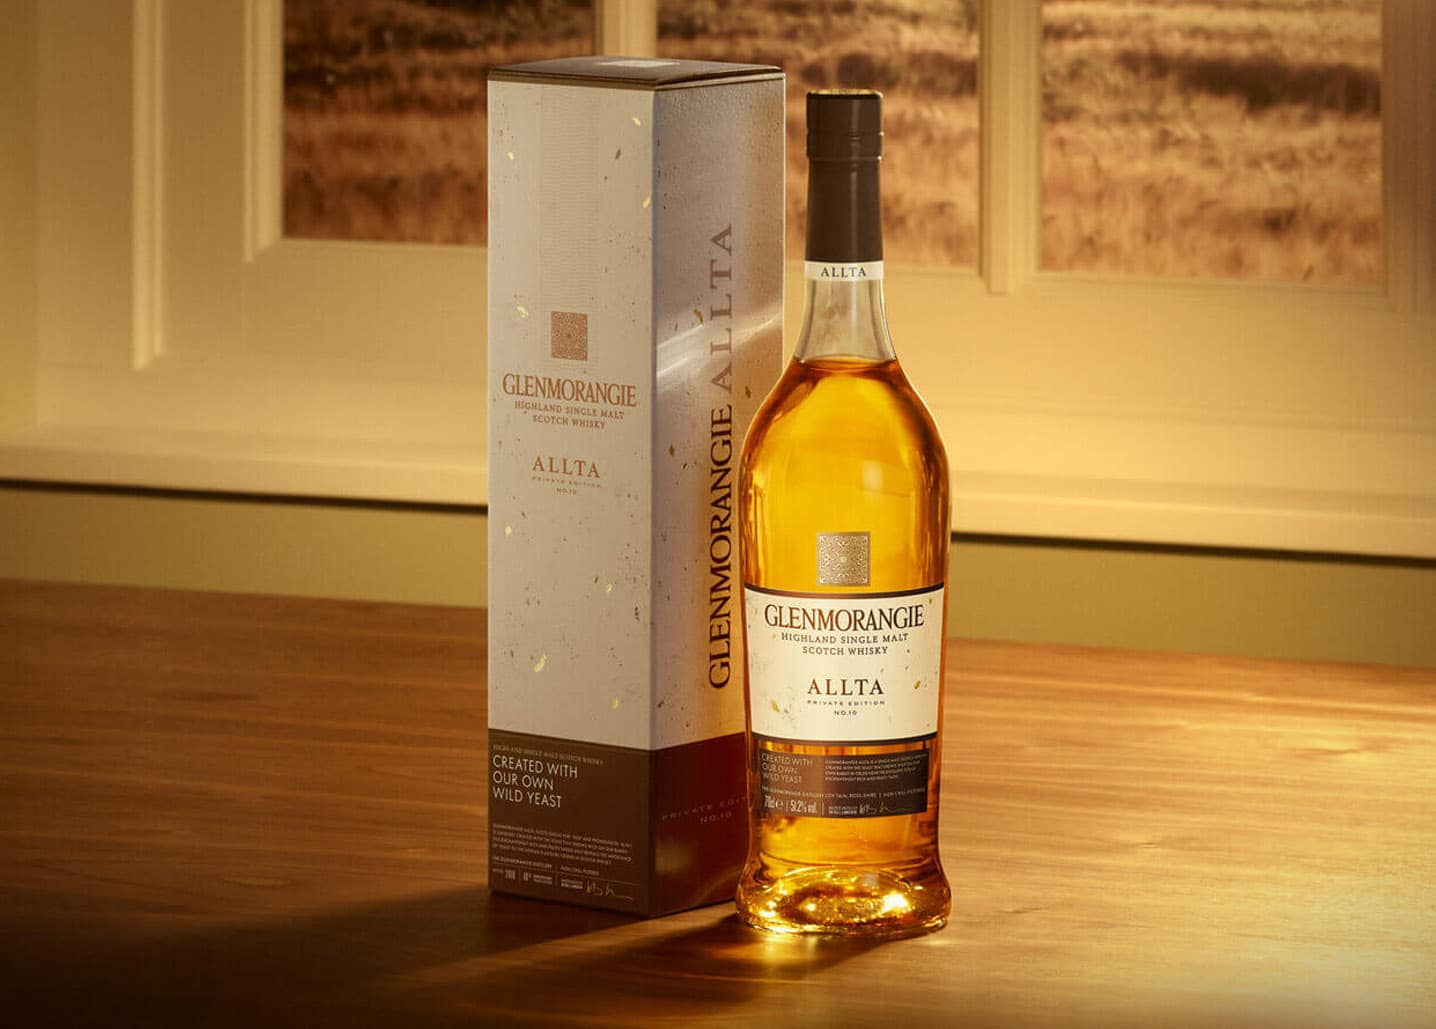 Glenmorangie Allta - Todo Whisky